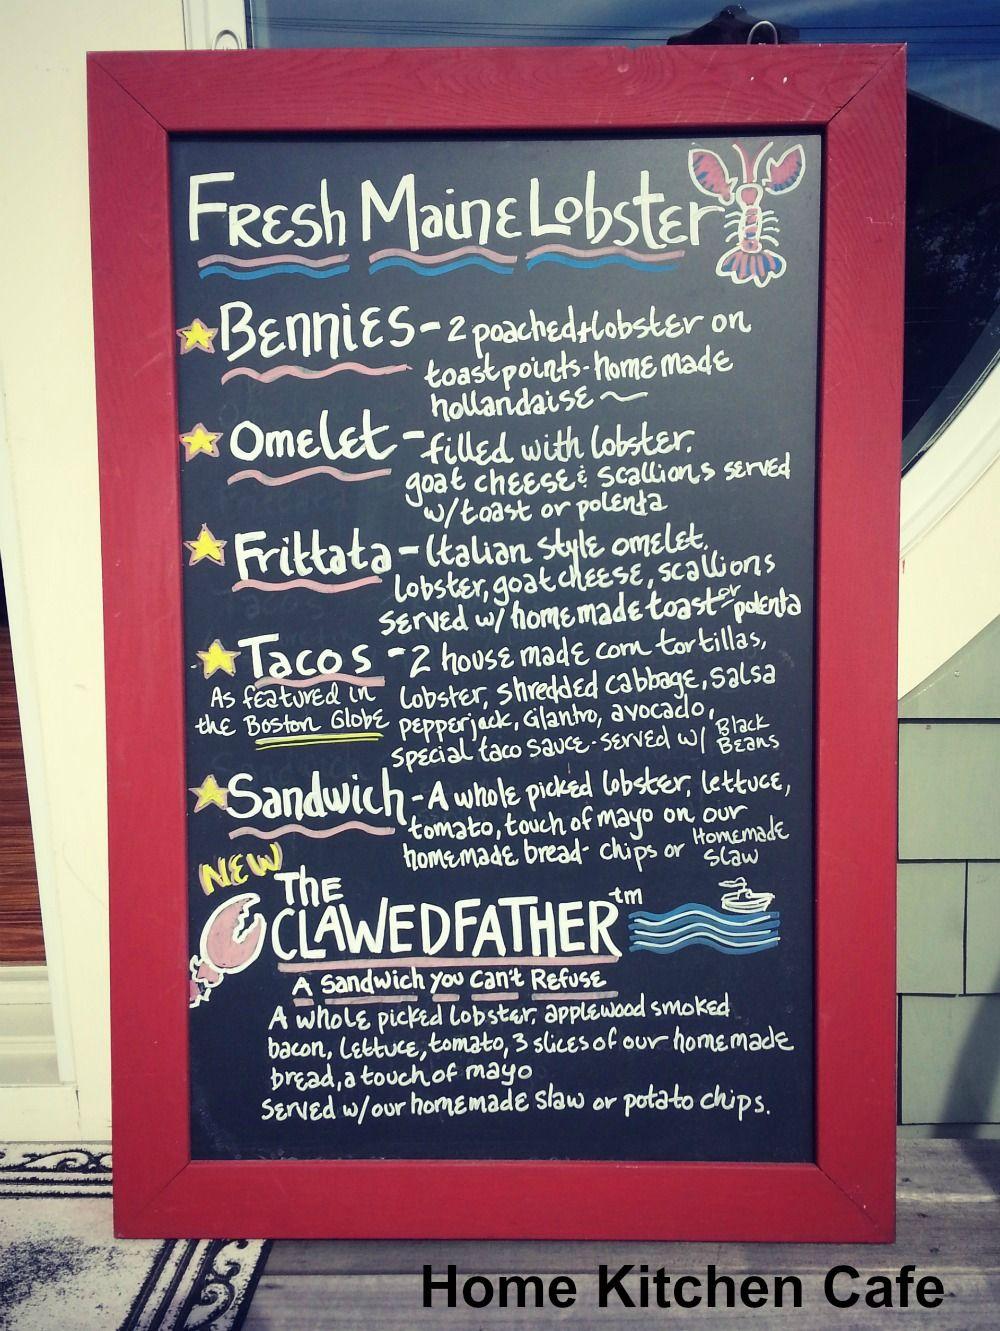 Home Kitchen Cafe Rockland Maine Menu